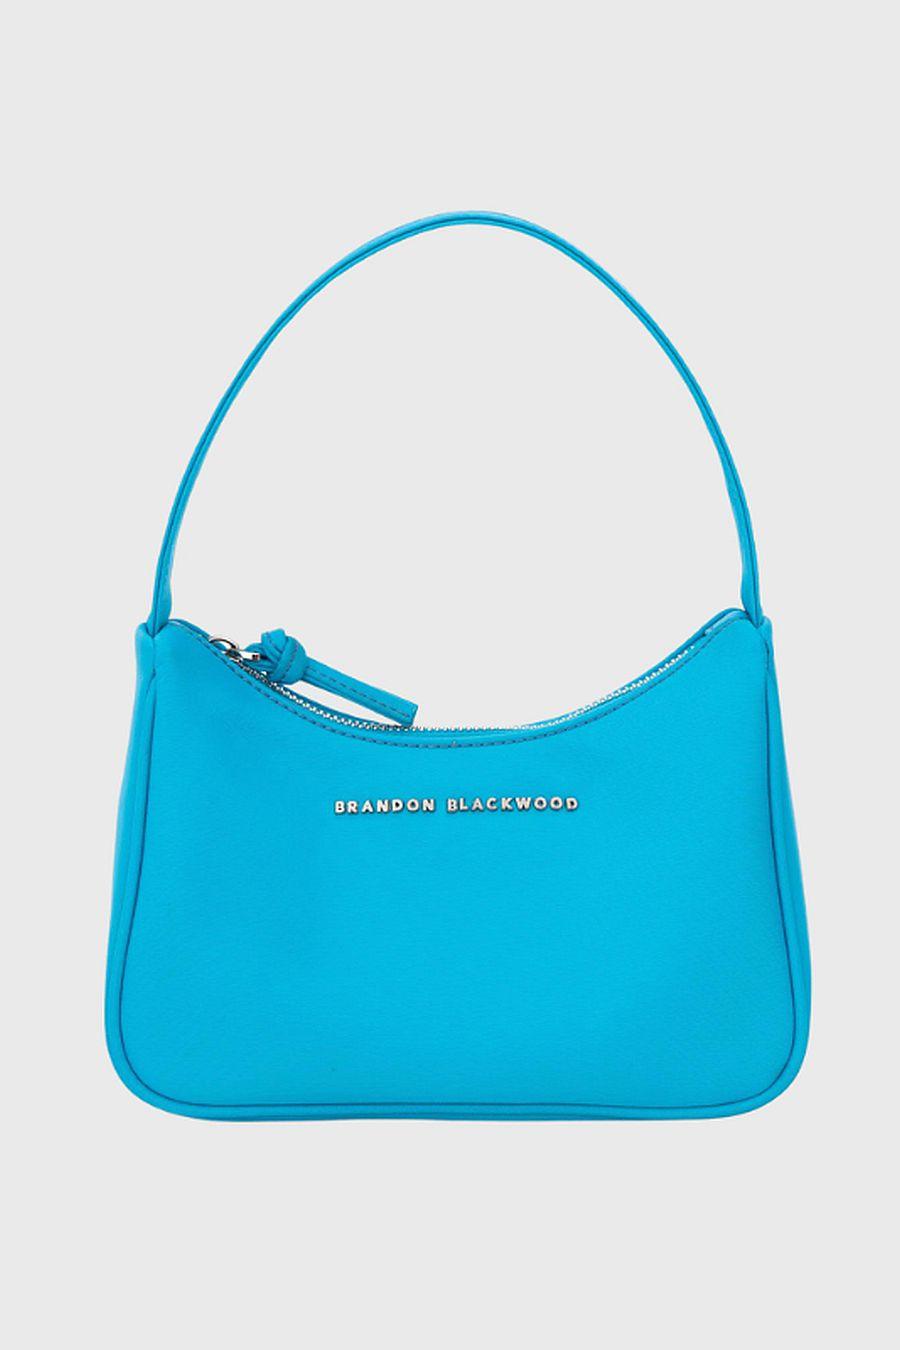 Brandon Blackwood Syl Bag - Baby Blue Nylon